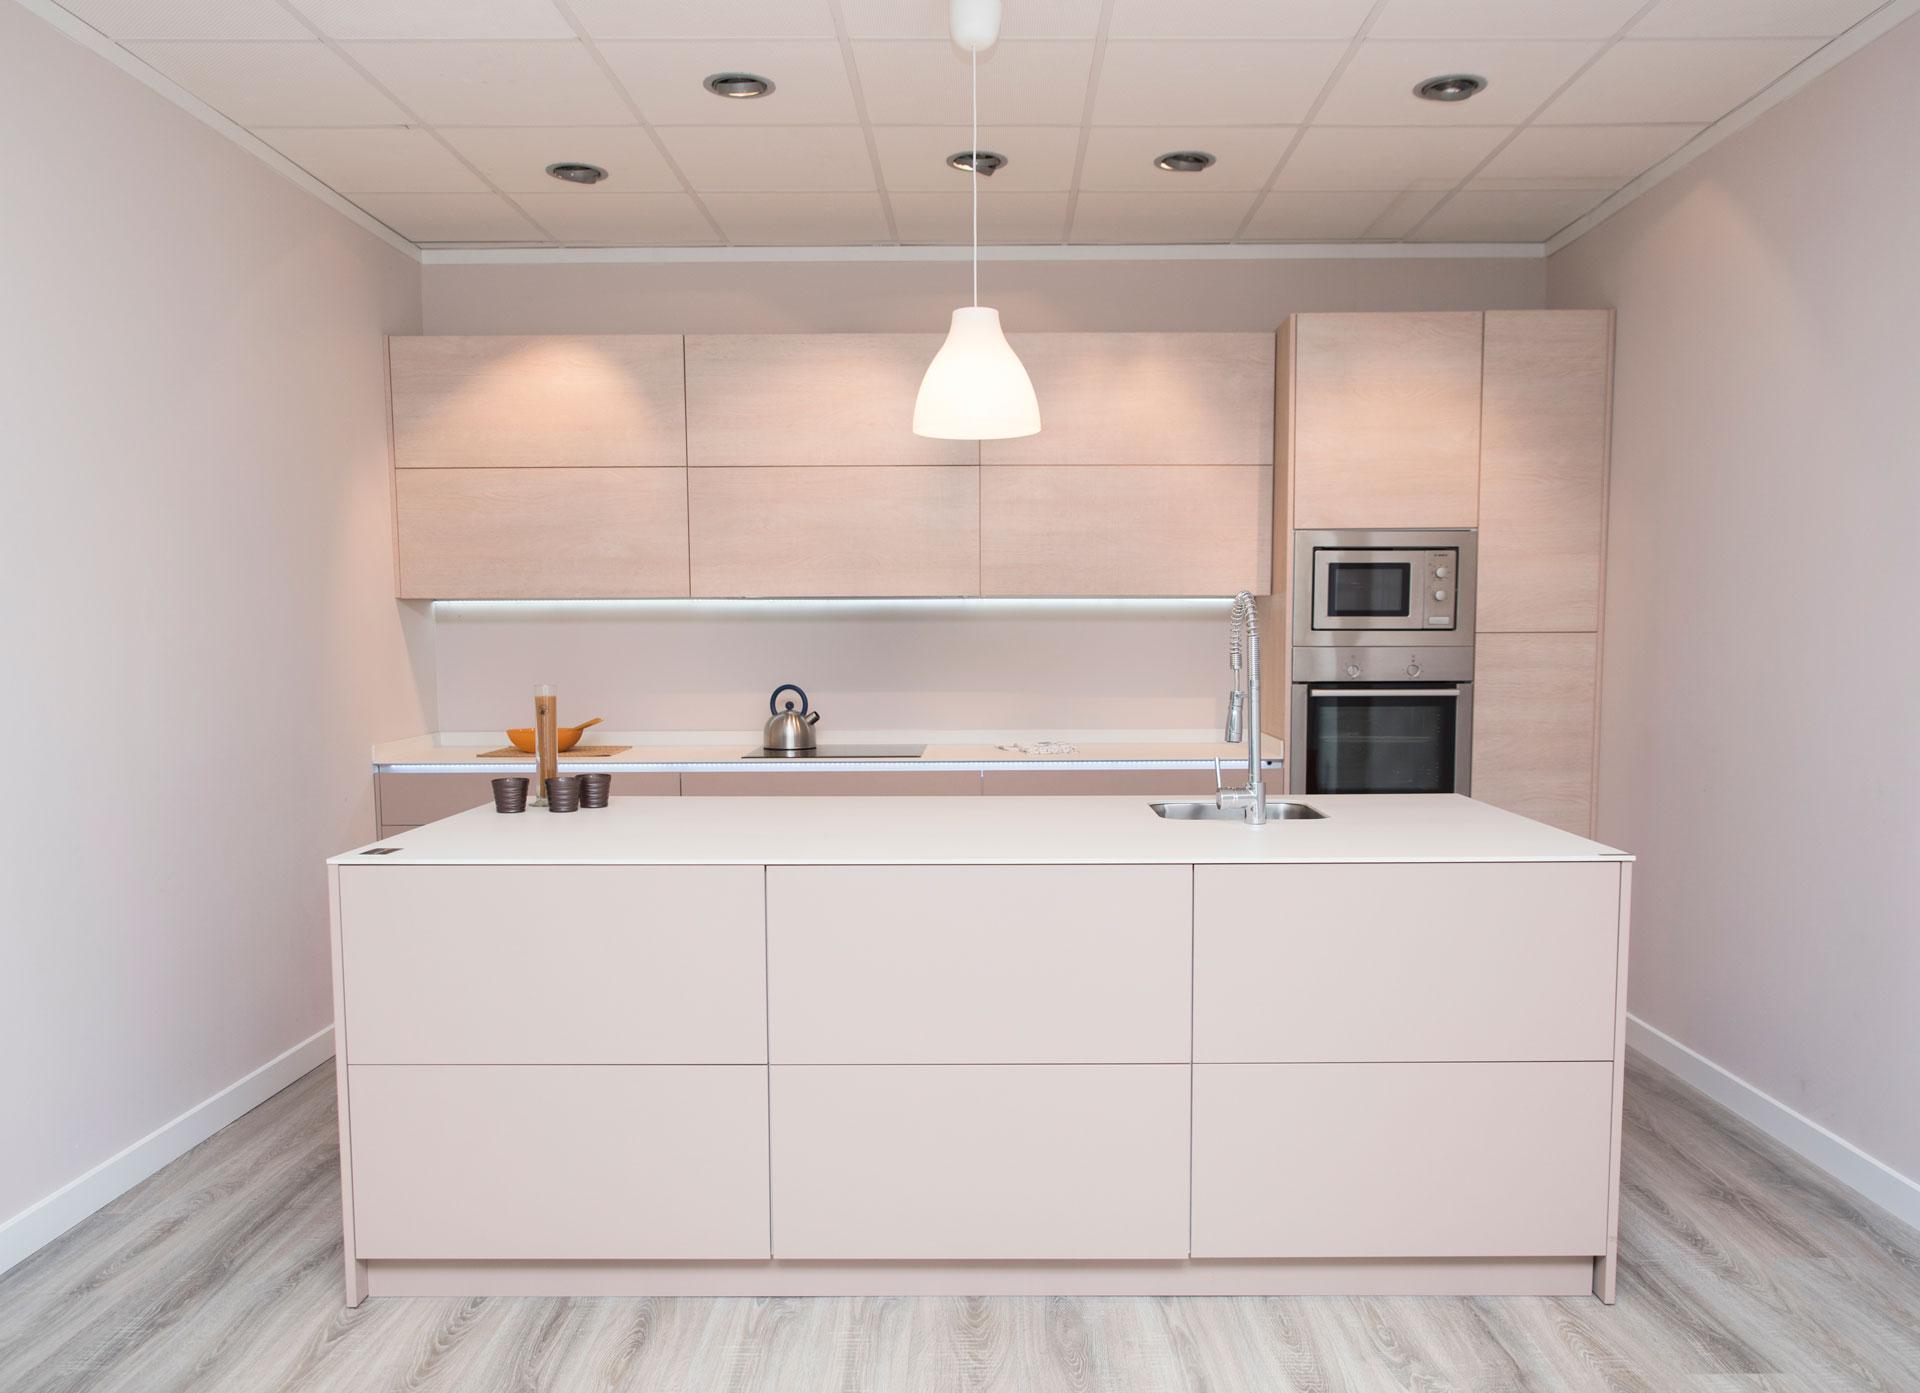 Tipos de cocinas laminadas arcomobel - Tipos de cocinas ...